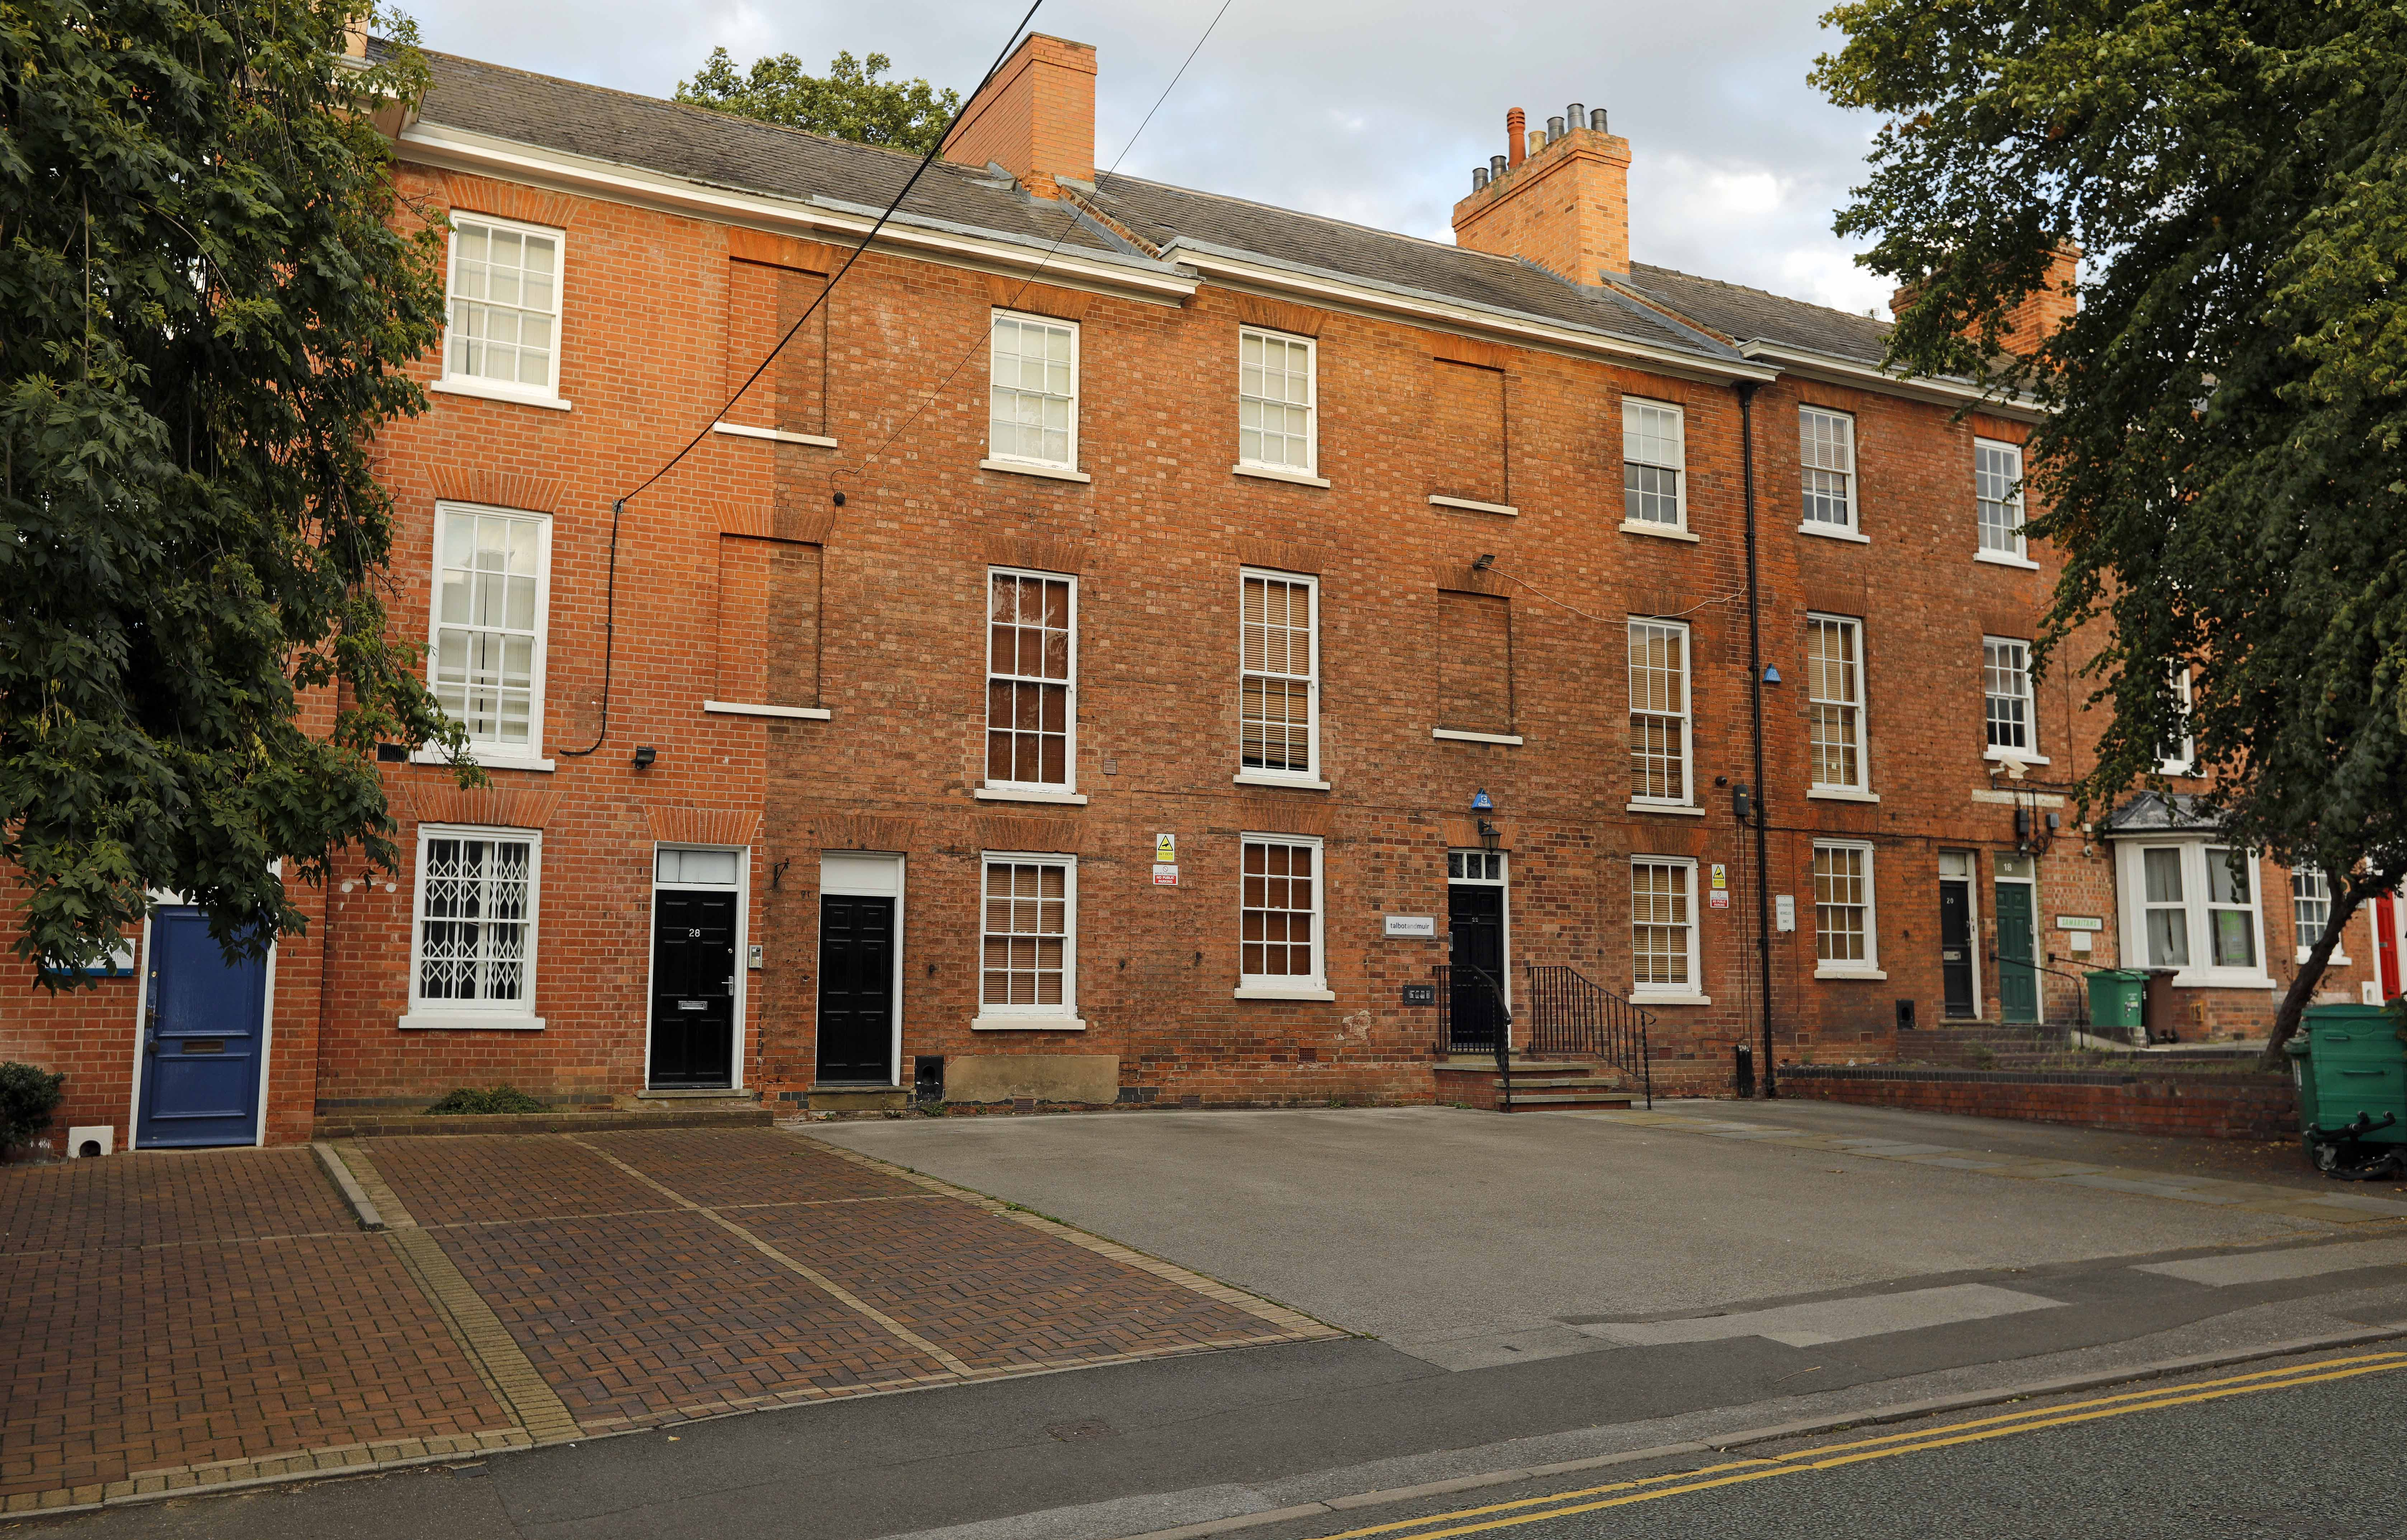 20-26 Clarendon Street, Nottingham - 25